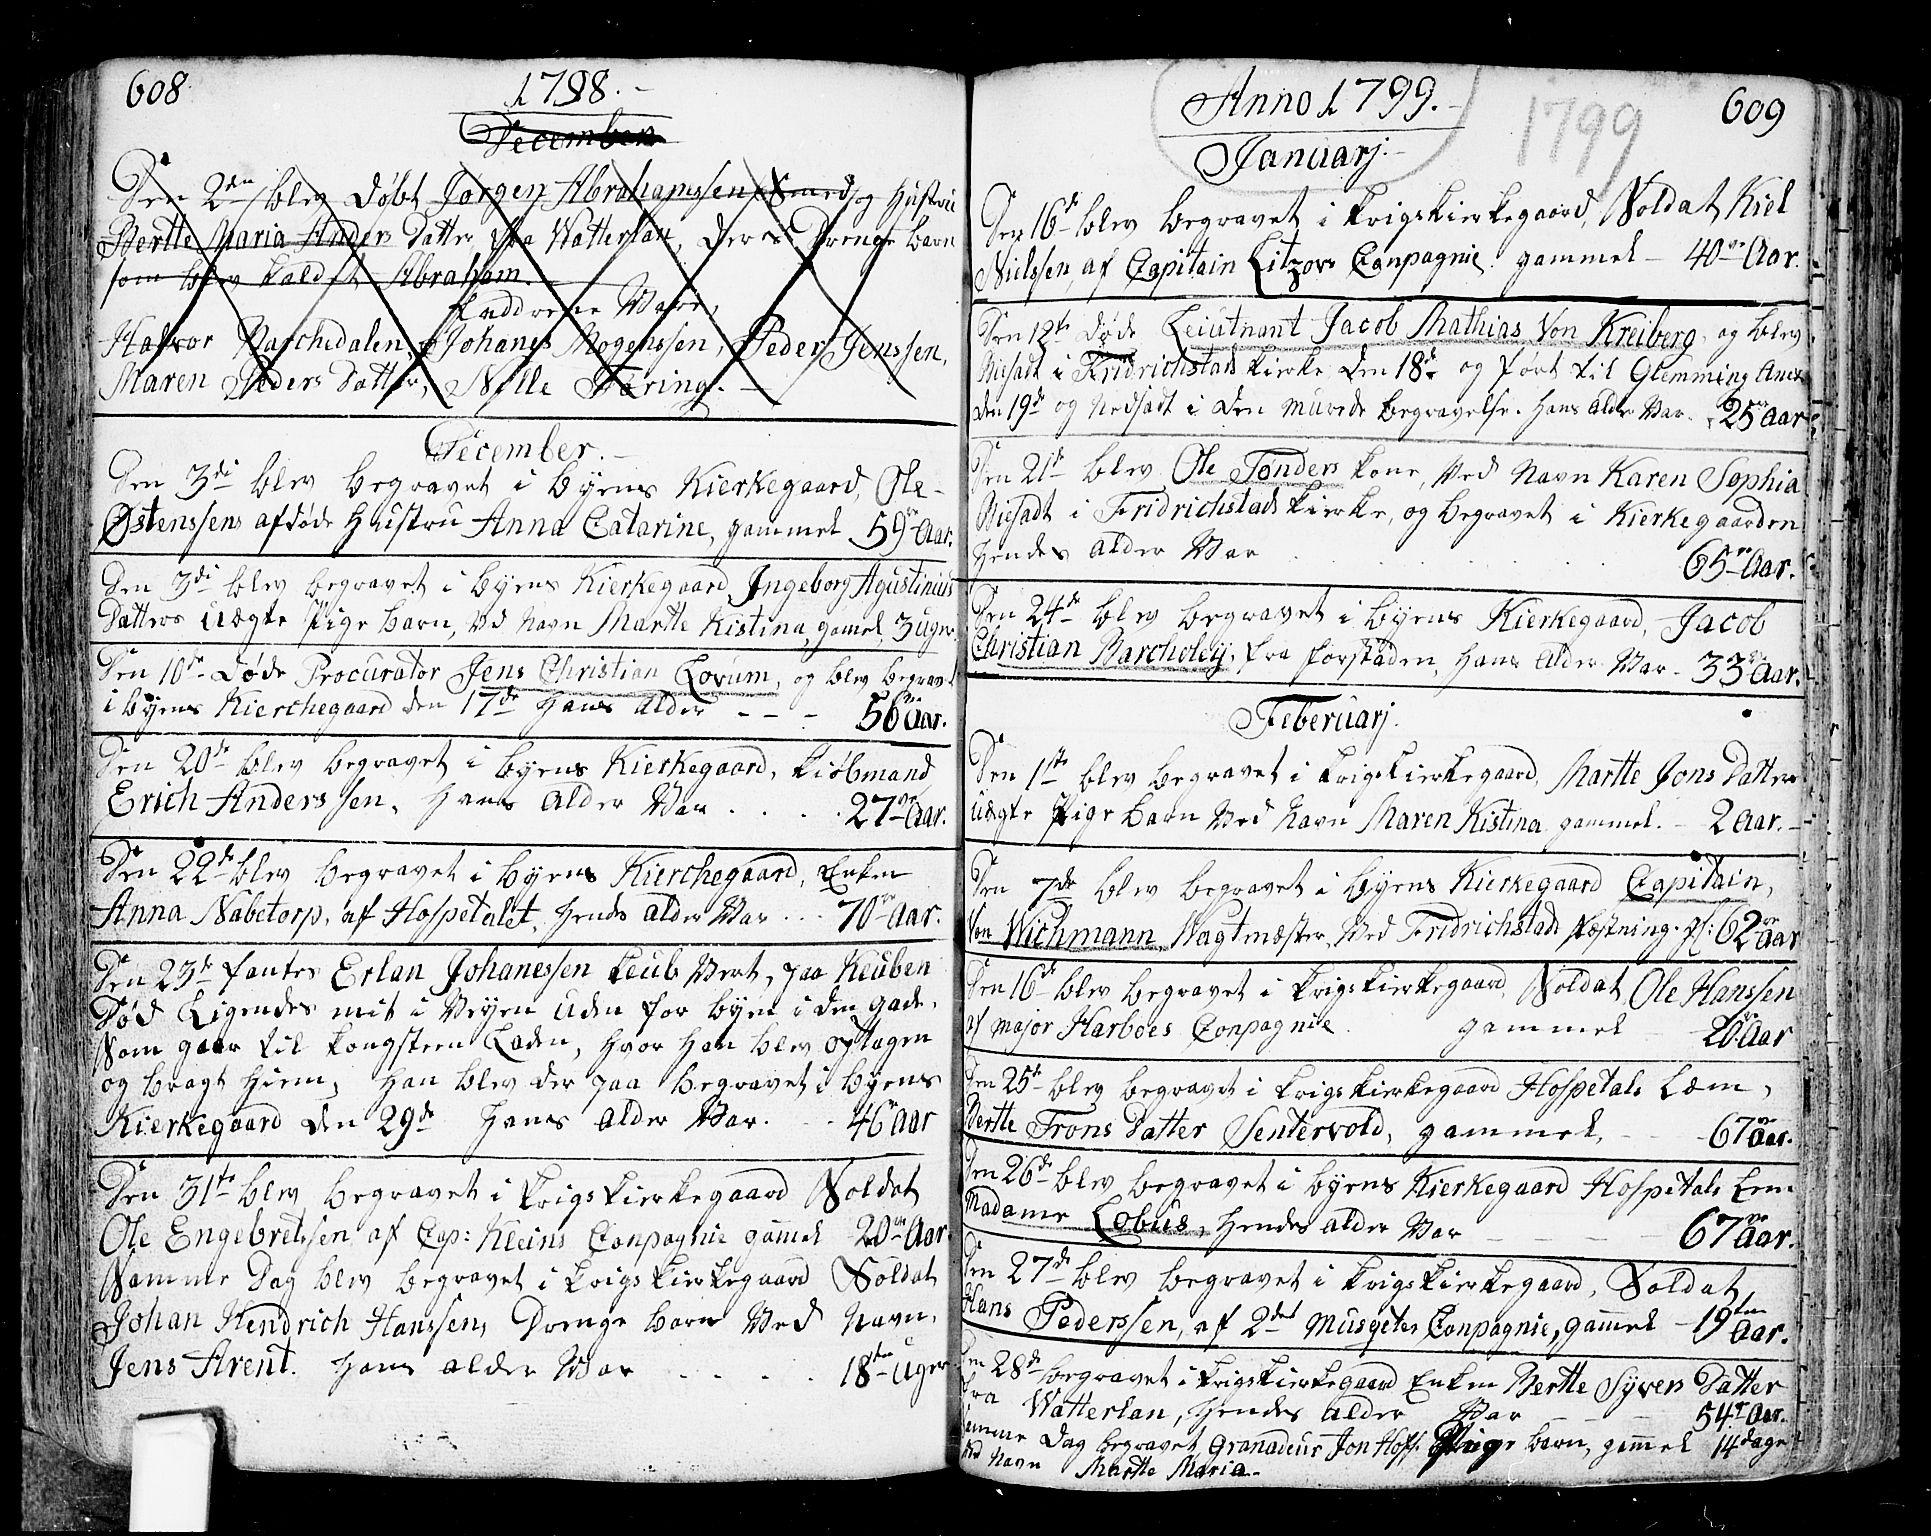 SAO, Fredrikstad prestekontor Kirkebøker, F/Fa/L0002: Ministerialbok nr. 2, 1750-1804, s. 608-609